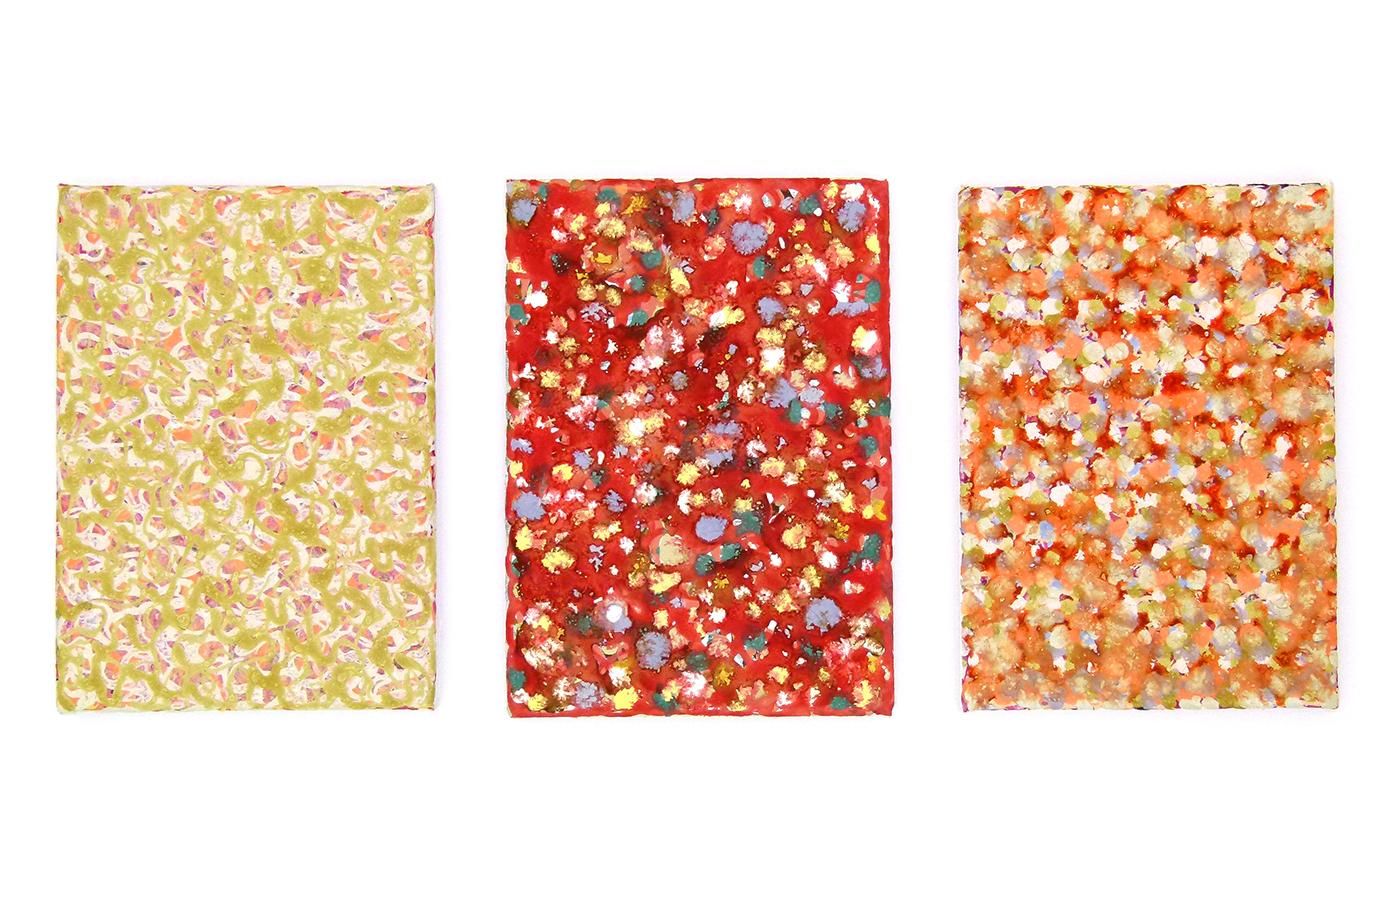 Farbige Tusche auf Leinwand 1_0001_L1100027a